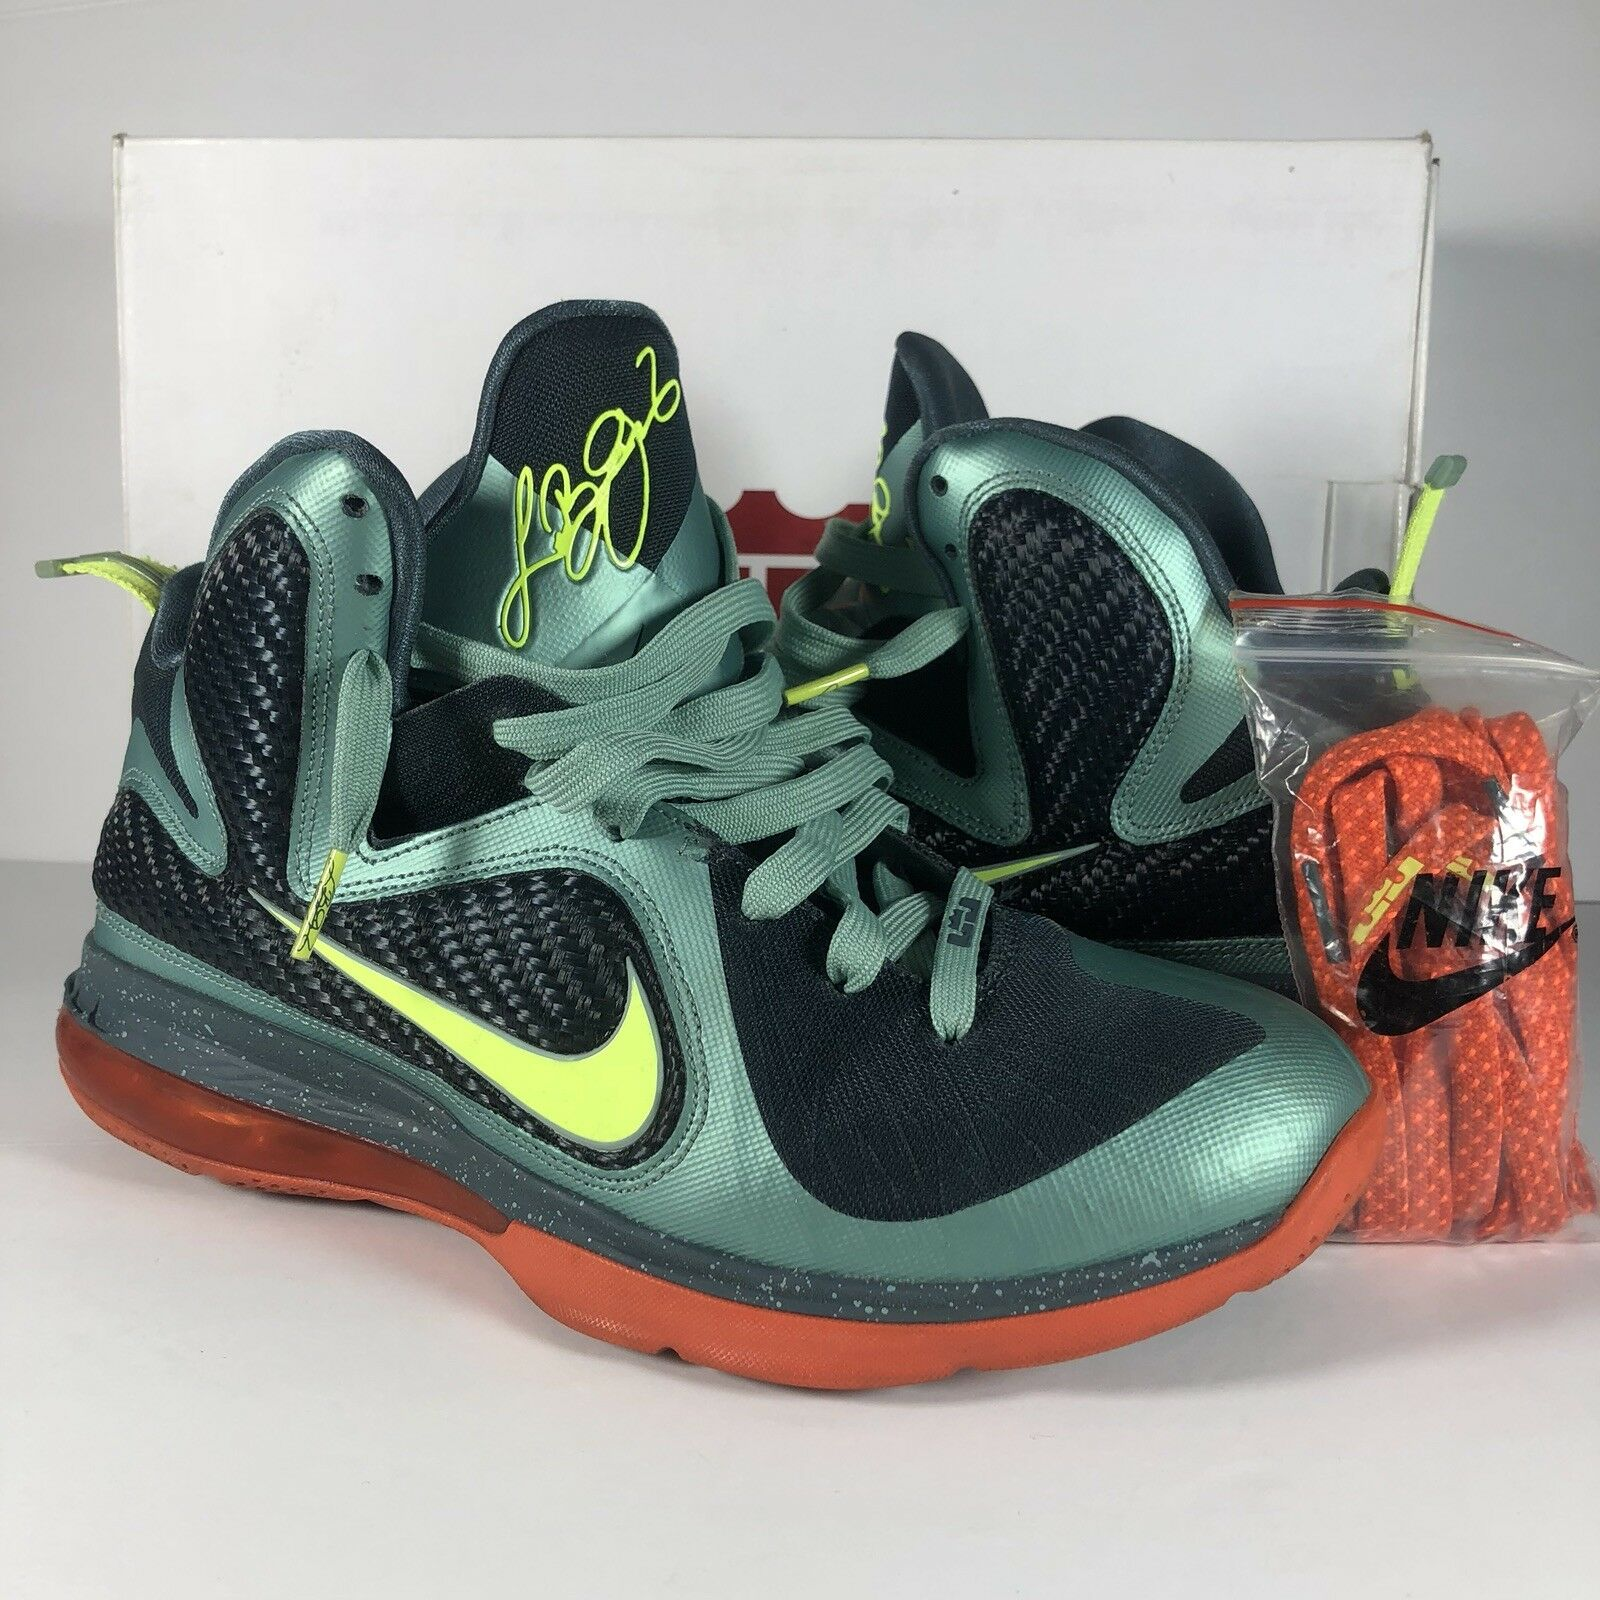 Nike LEBRON IX 9 Cannon Men's shoes 469764-004 Volt Slate bluee orange Sz 9